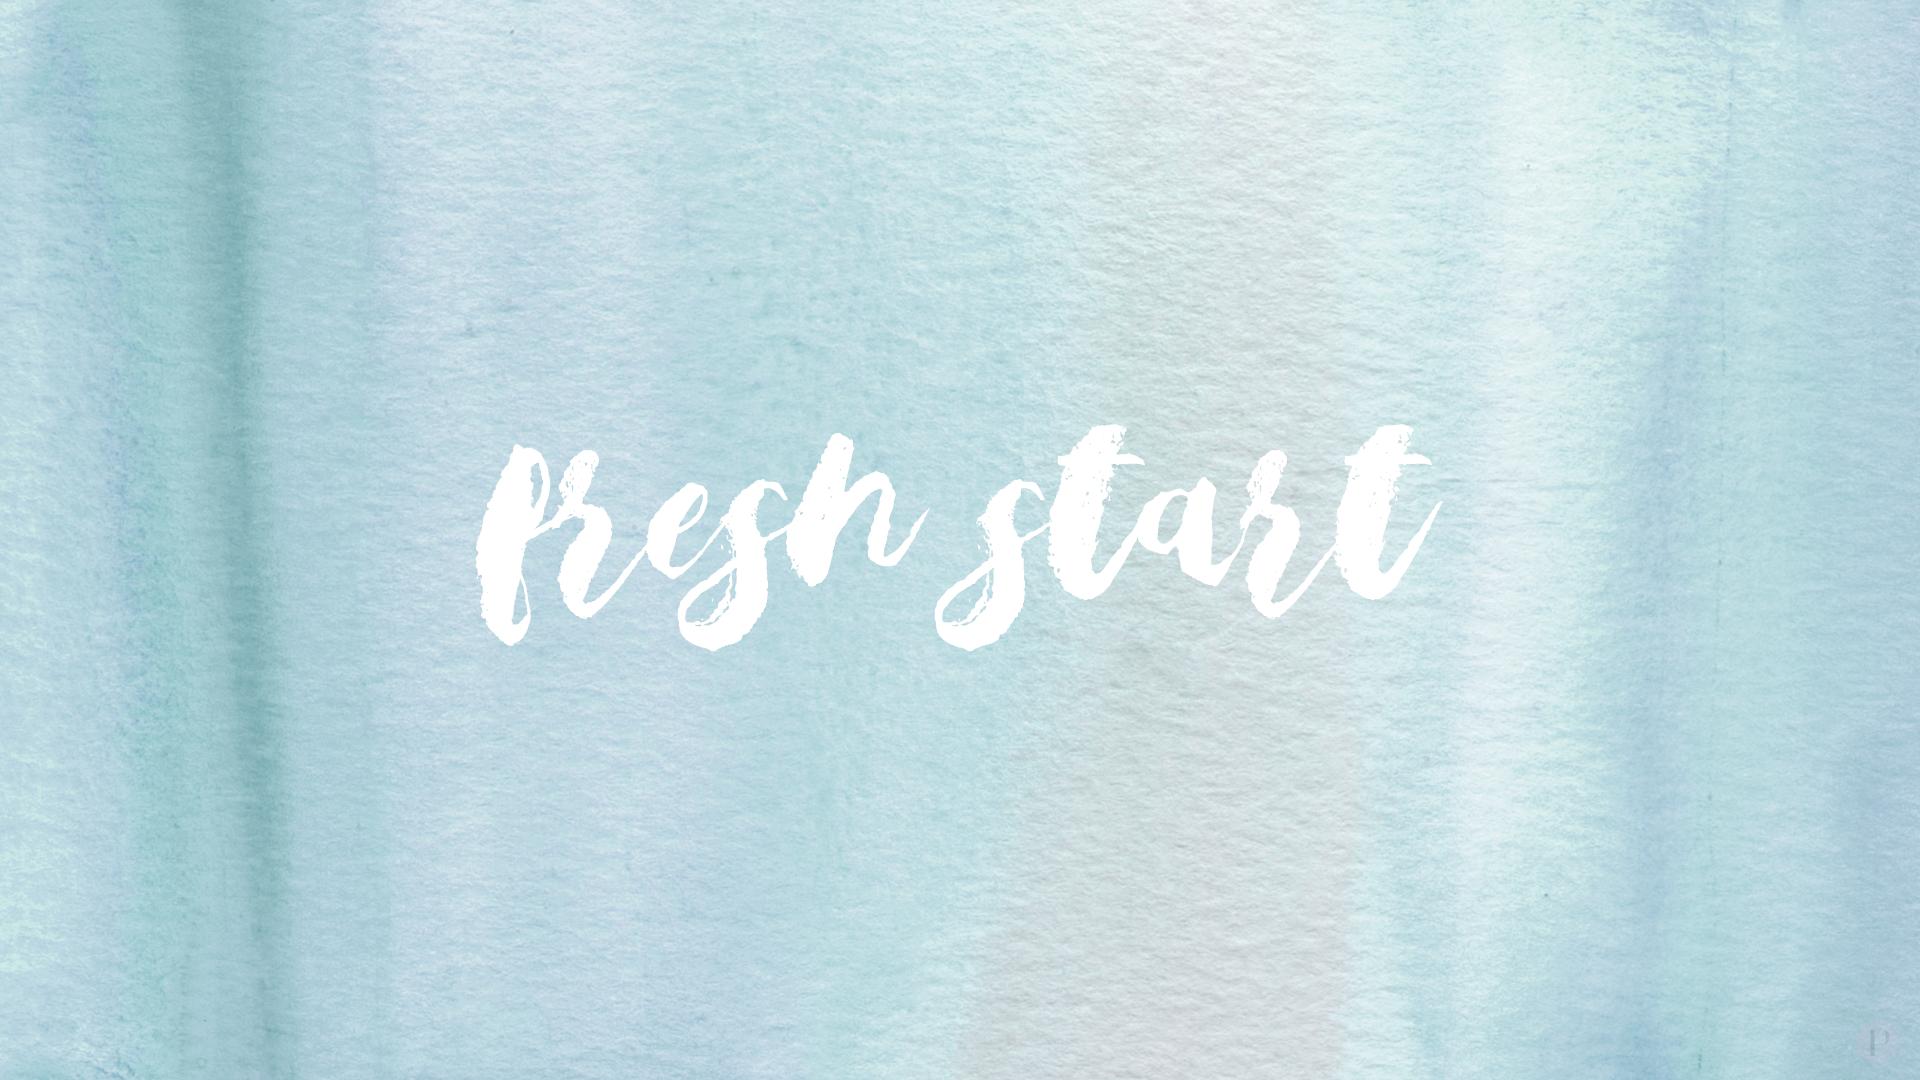 Fresh Start Free Desktop Wallpaper Desktop Wallpaper Inspirational Phone Wallpaper